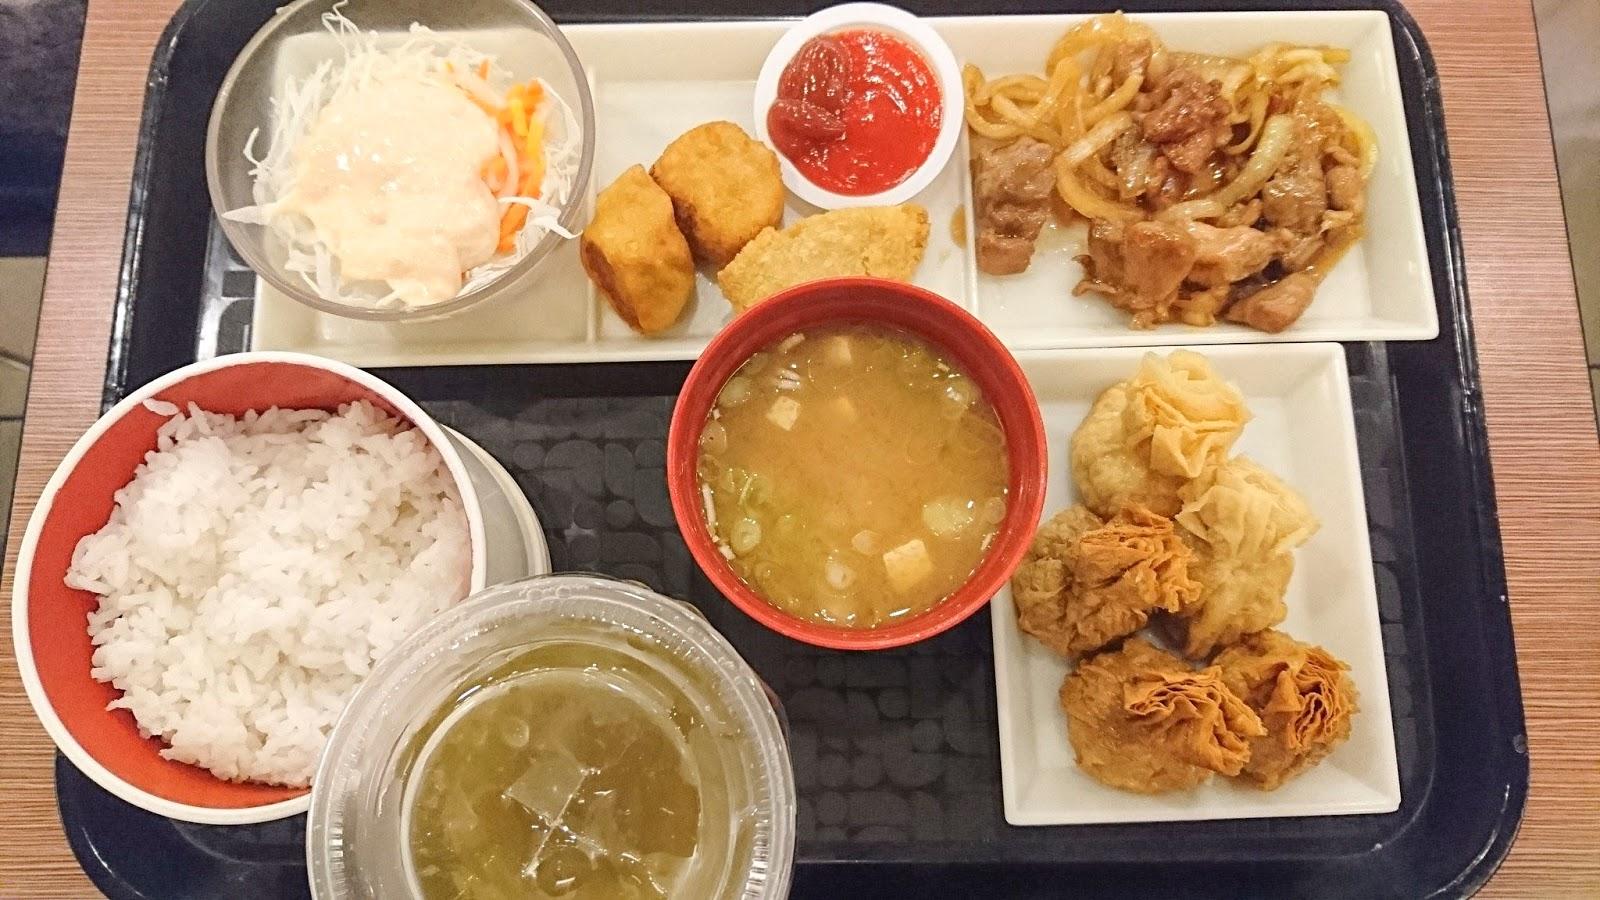 Harga Menu Delivery Hoka Hoka Bento (HokBen) 2017